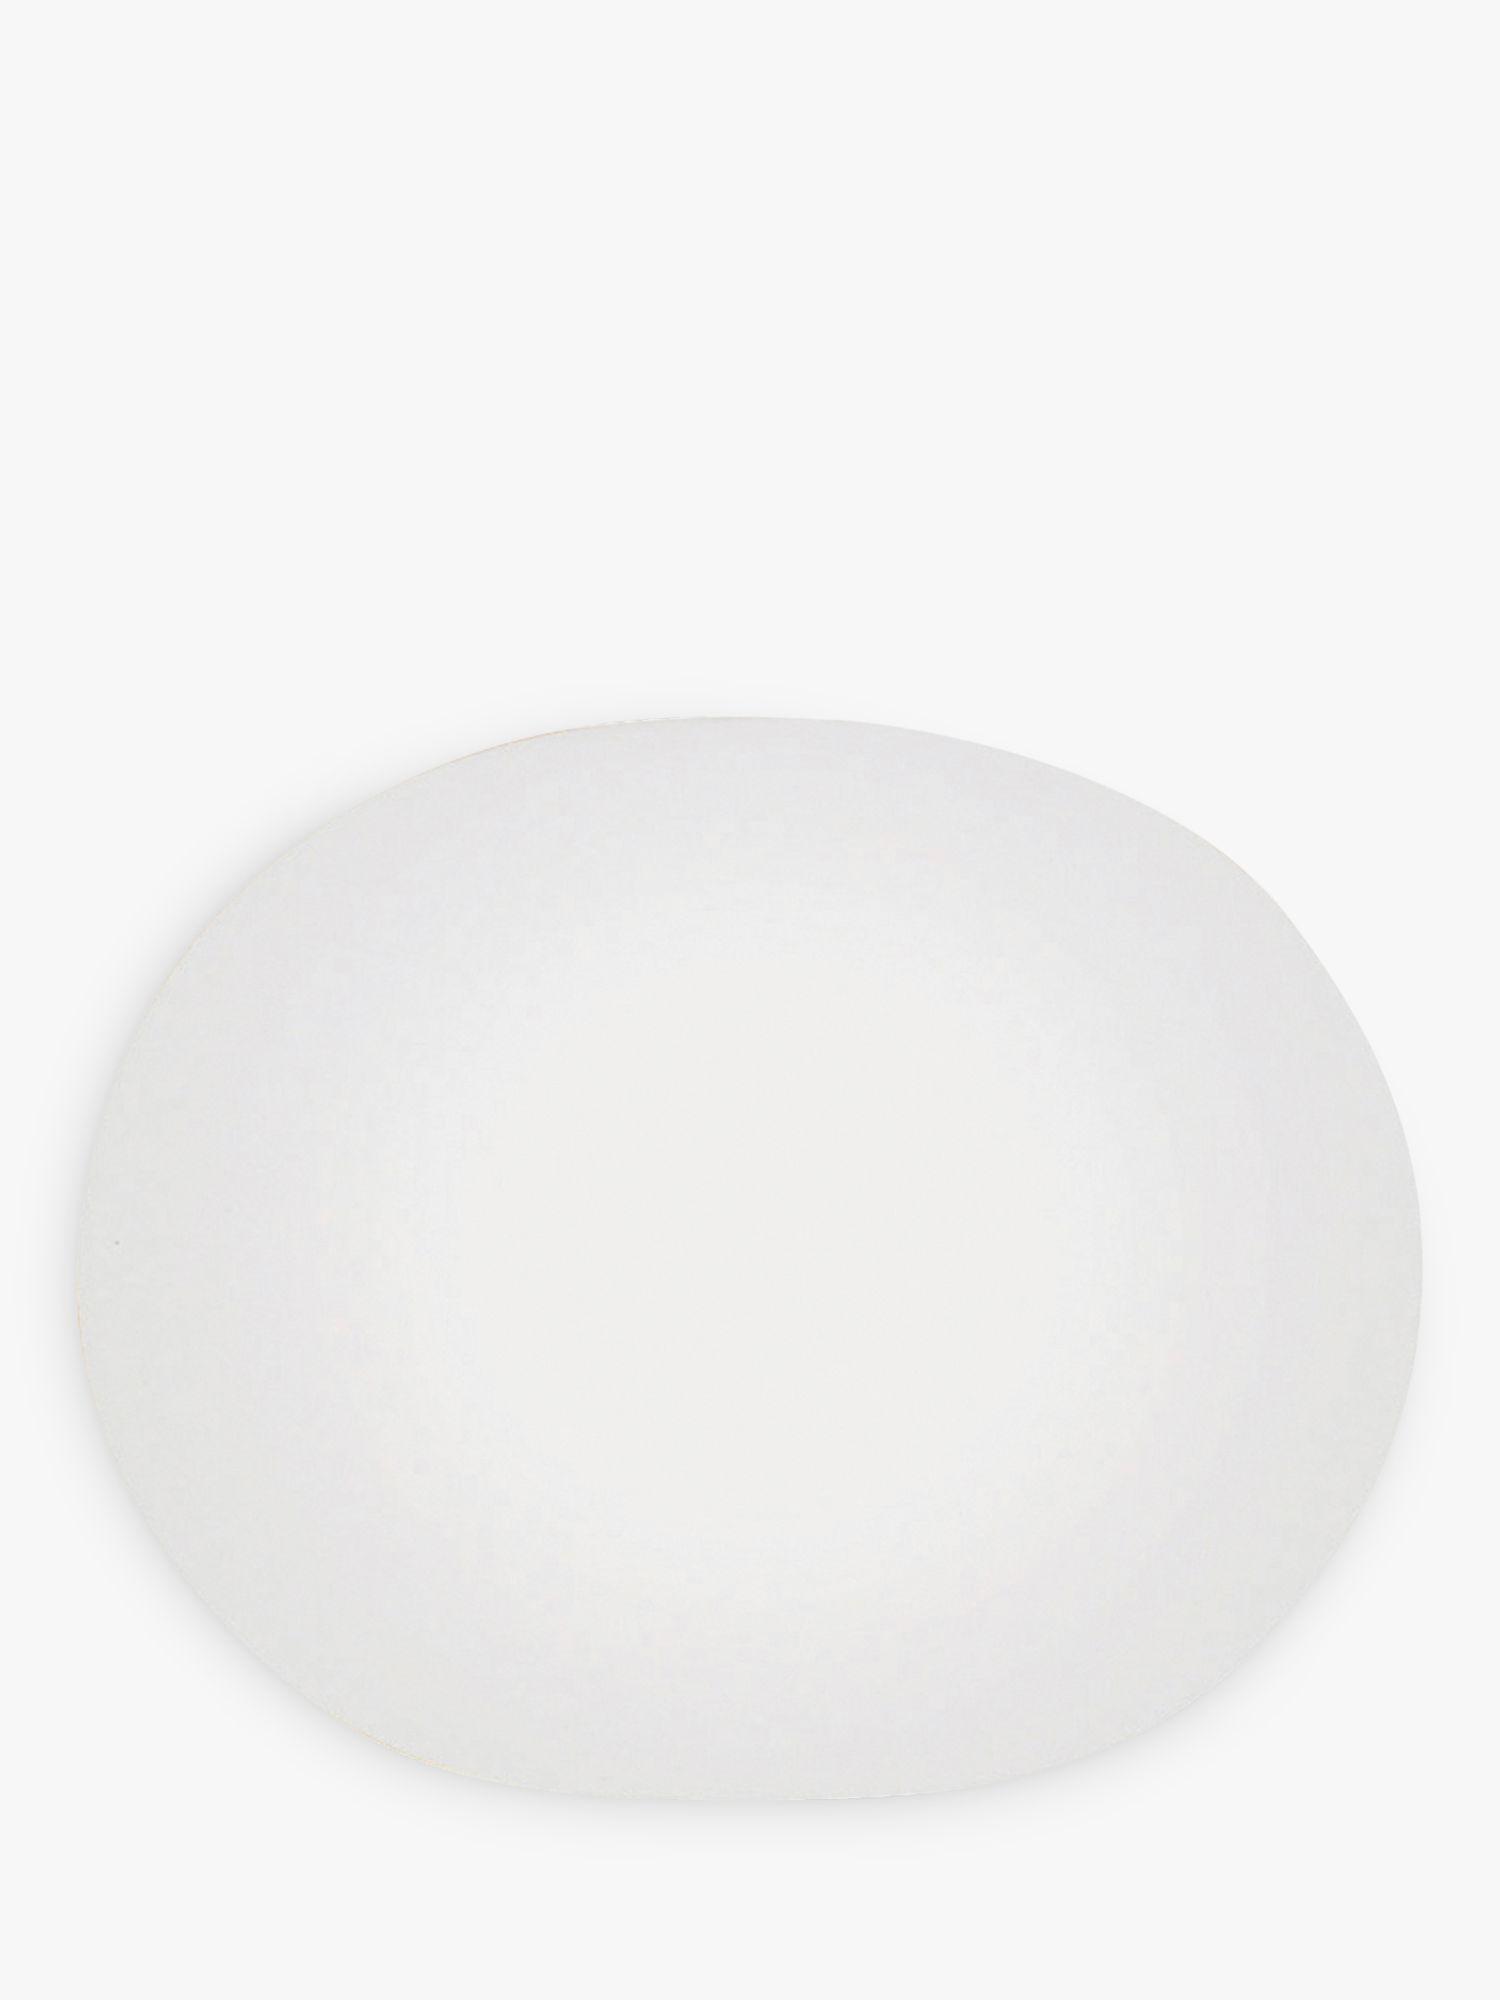 Flos Flos Glo-Ball W Wall Light, White